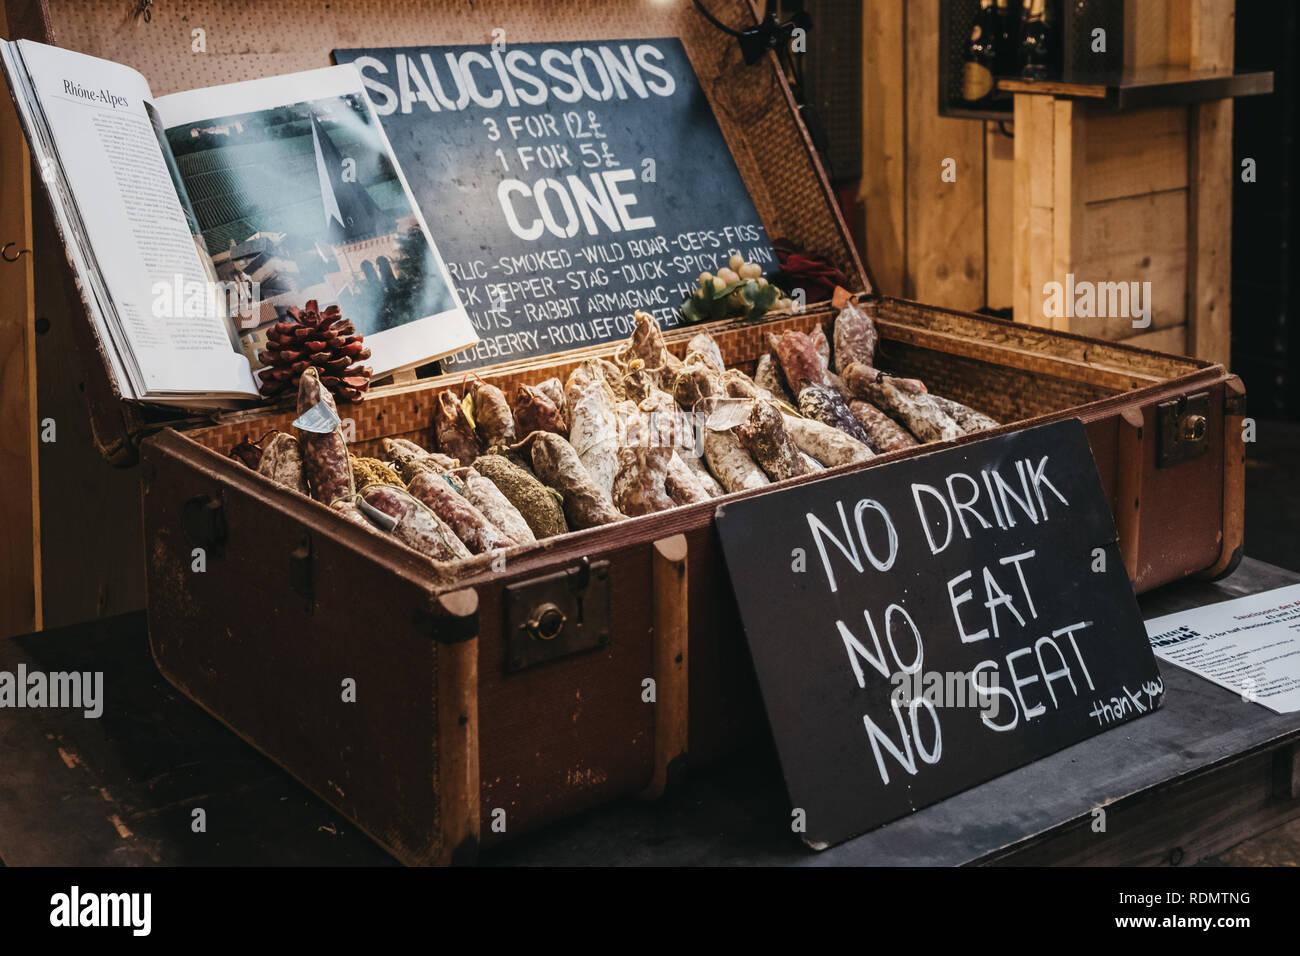 London, UK - January 13, 2019: Saucissons on sale at Mercato Metropolitano, sustainable community market in London focused on revitalising the area an - Stock Image